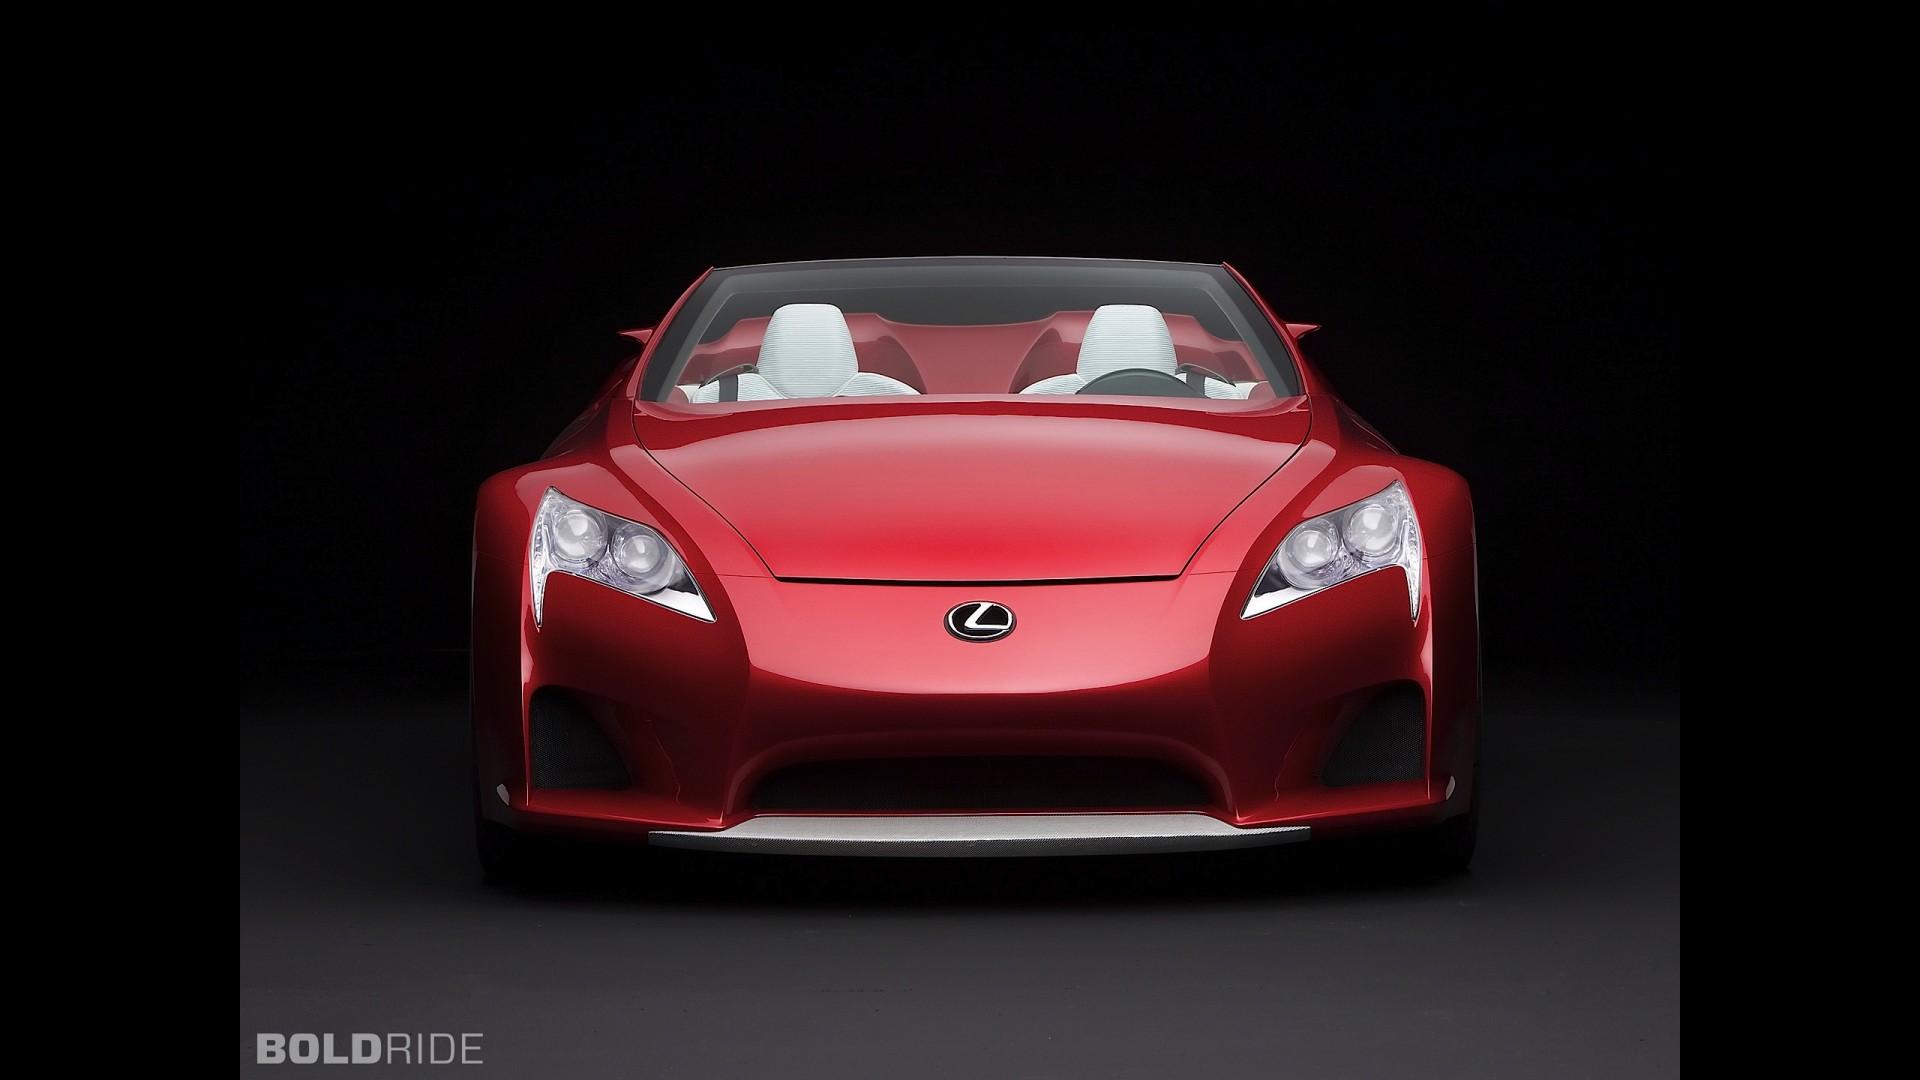 https://icdn-5.motor1.com/images/mgl/NBq89/s1/lexus-lf-a-roadster-concept.jpg